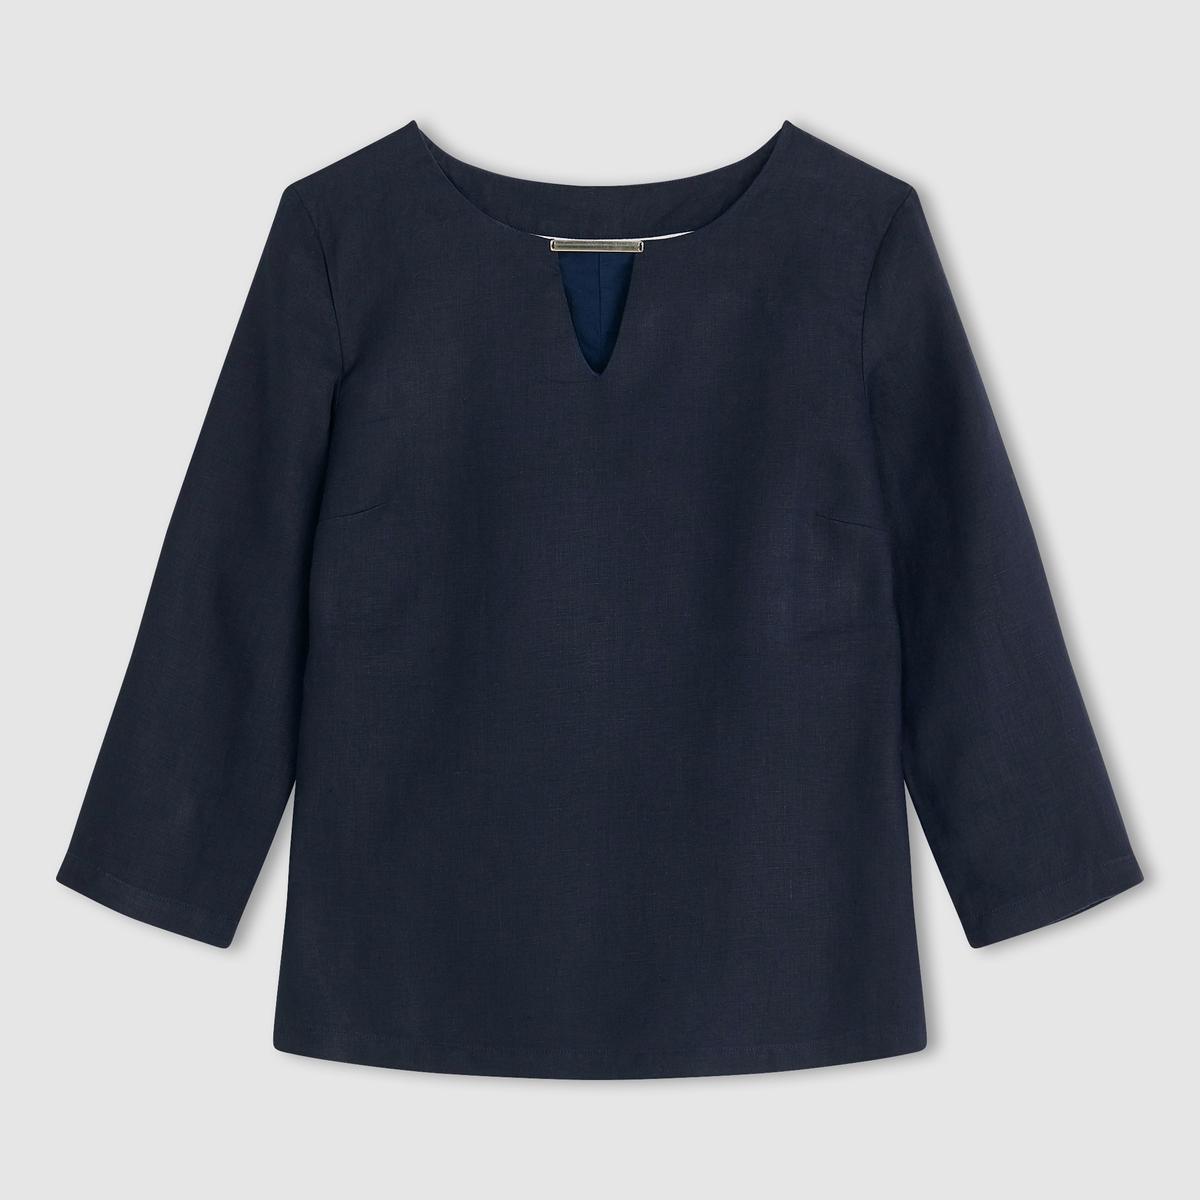 Блузка R essentiel 27284 от LaRedoute